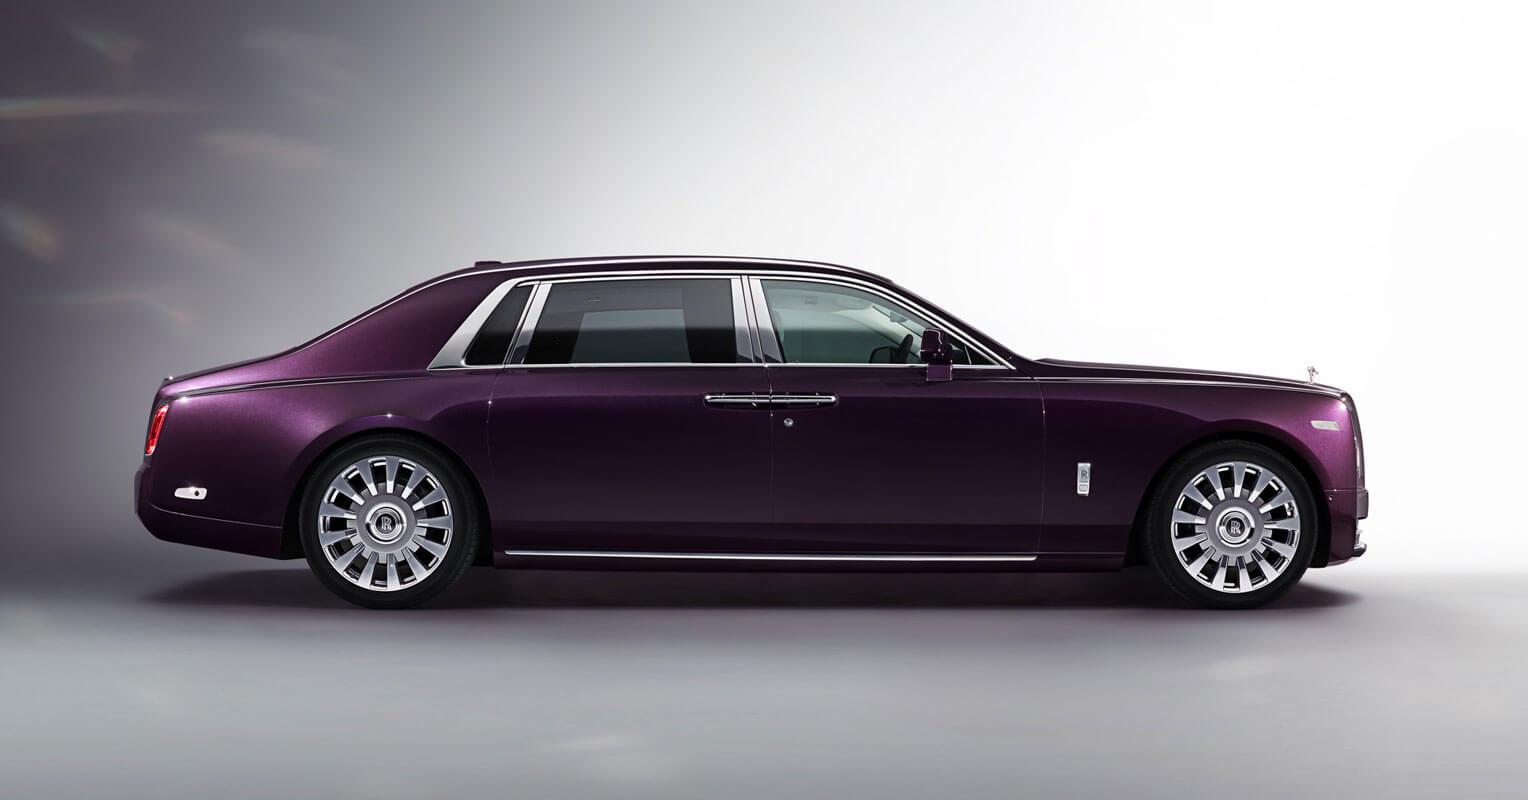 los coches más largos Roll Royce Phantom Extended Wheel Base